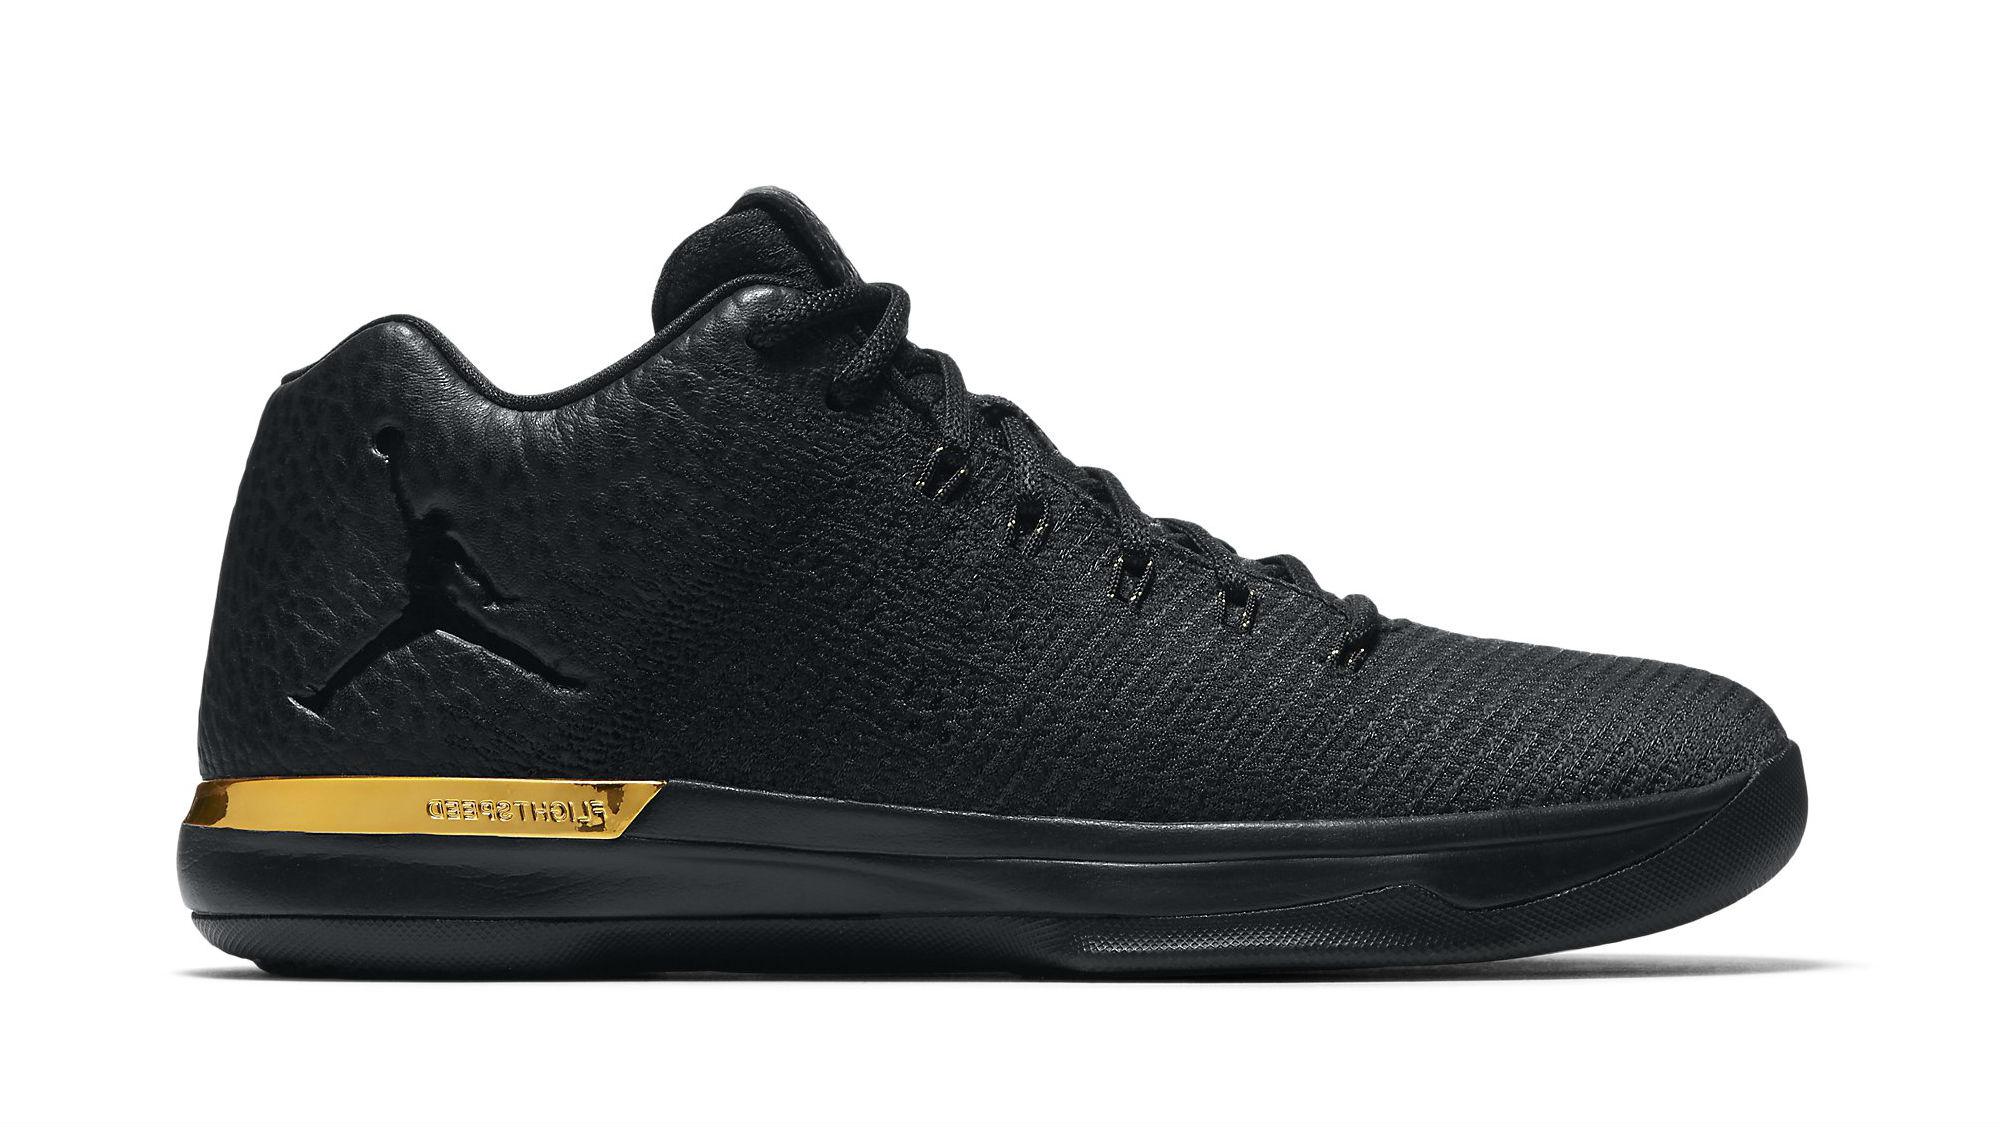 Air Jordan XXX1 Low Black/Anthracite-Metallic Gold